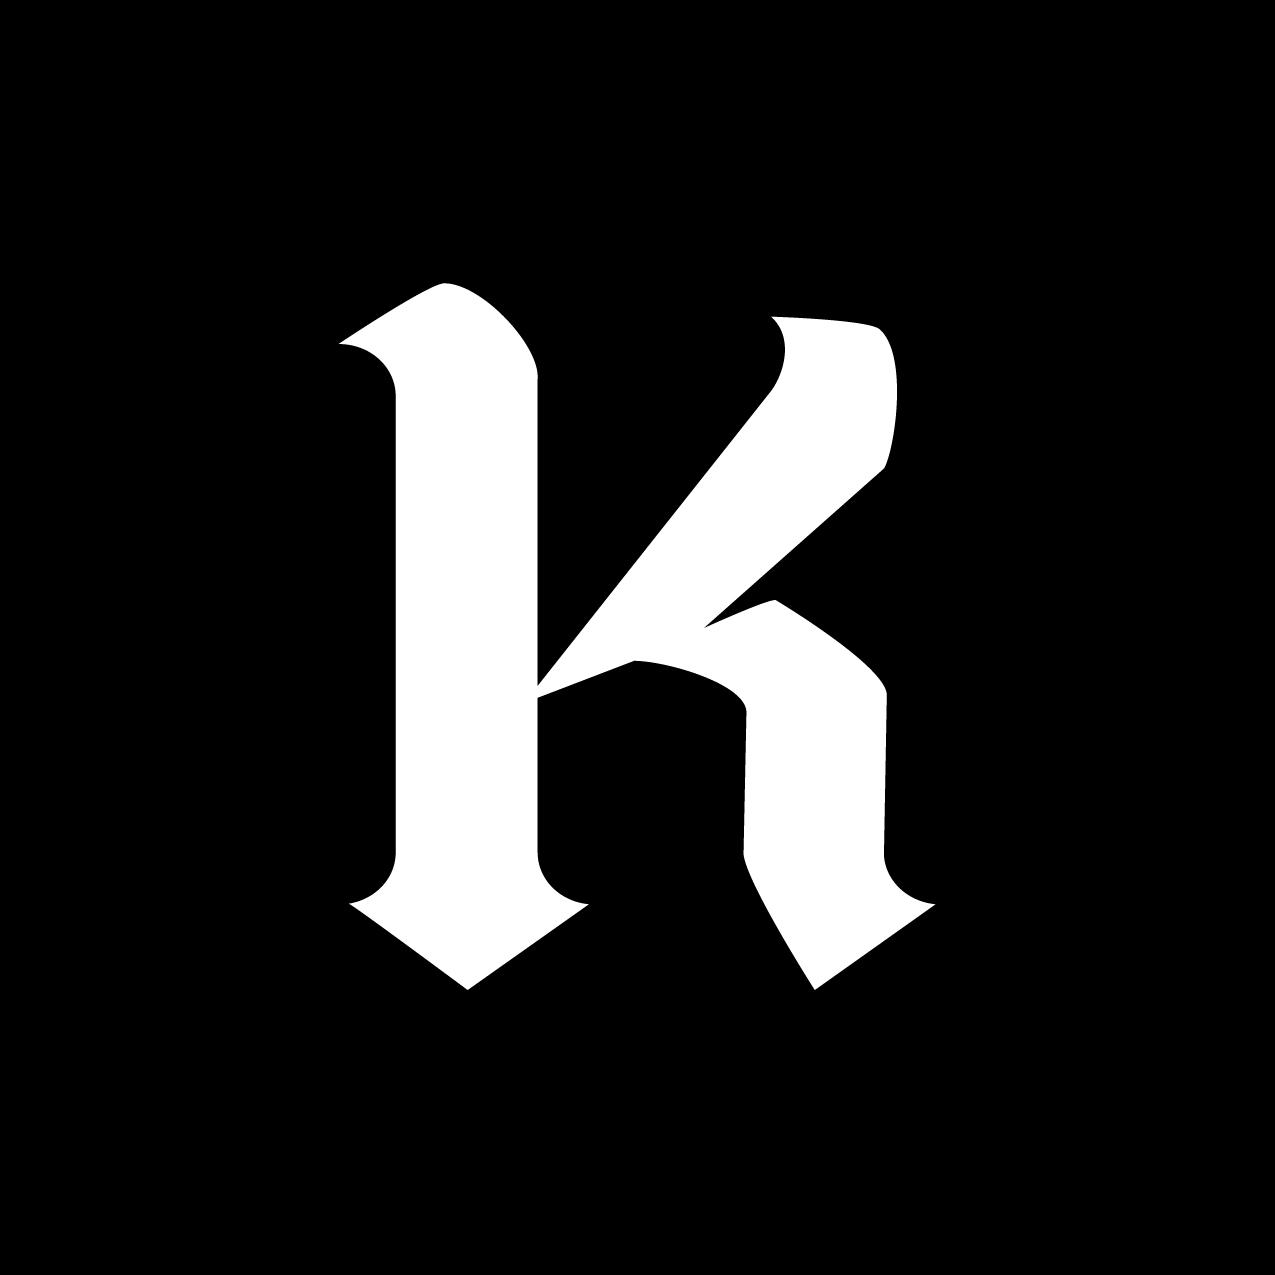 Letter K12 Design by Furia